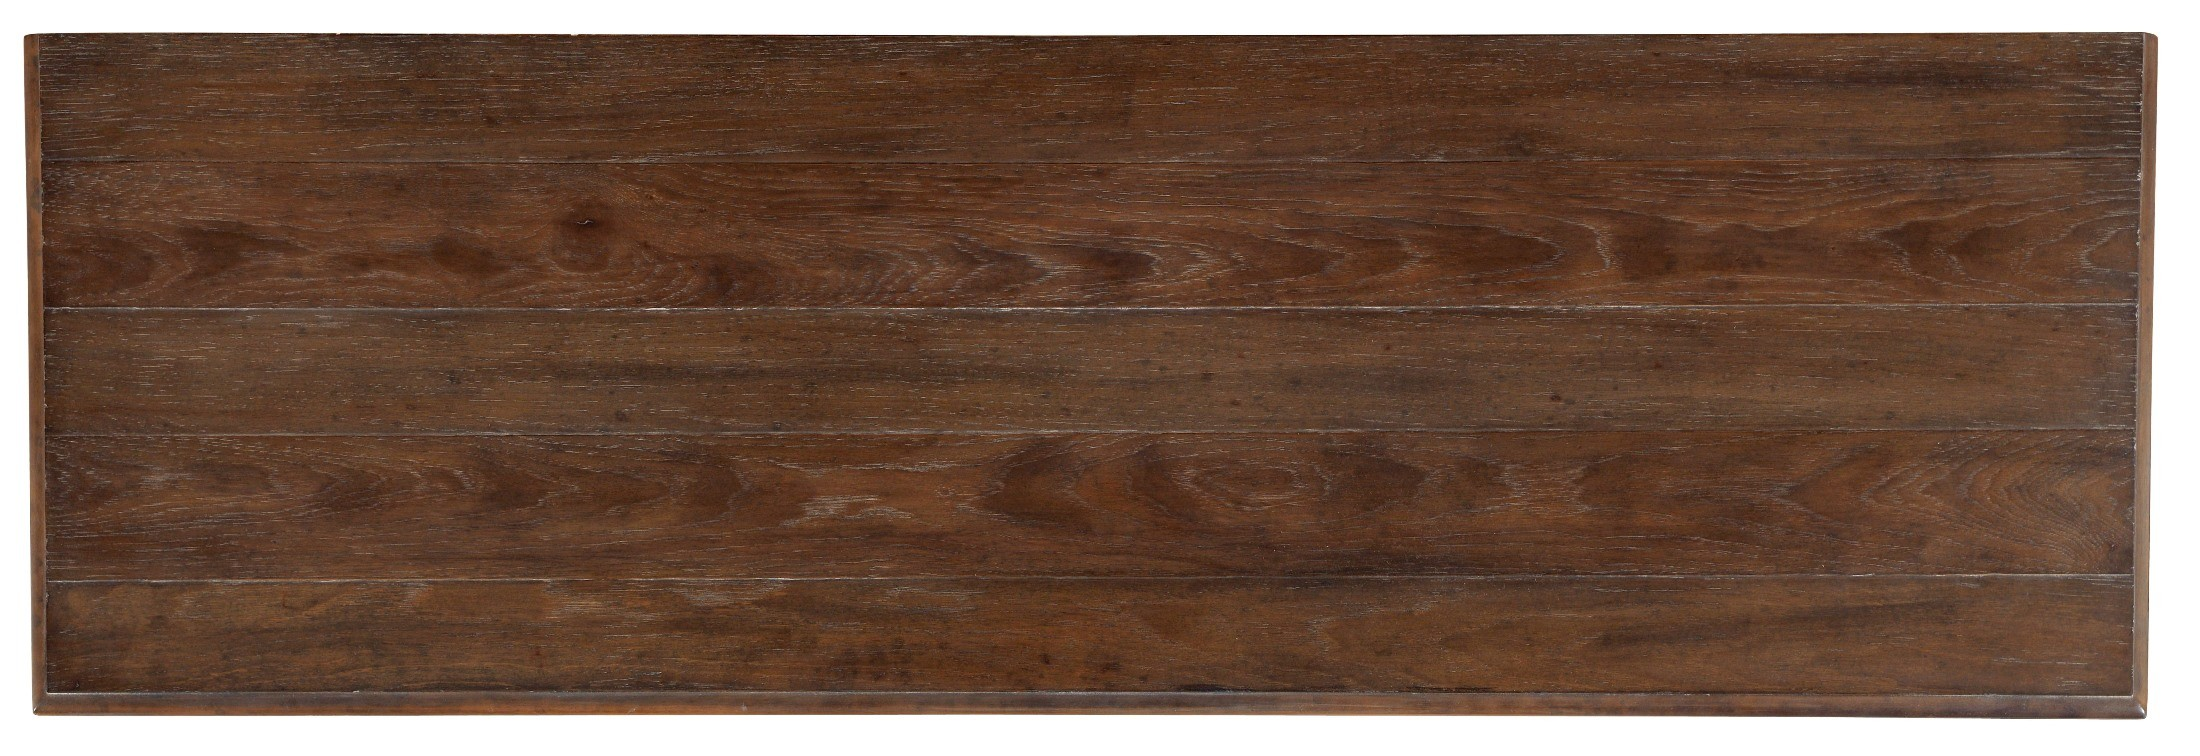 st germain distressed foxtail upholstered platform sleigh 2135215155 1513fb 1